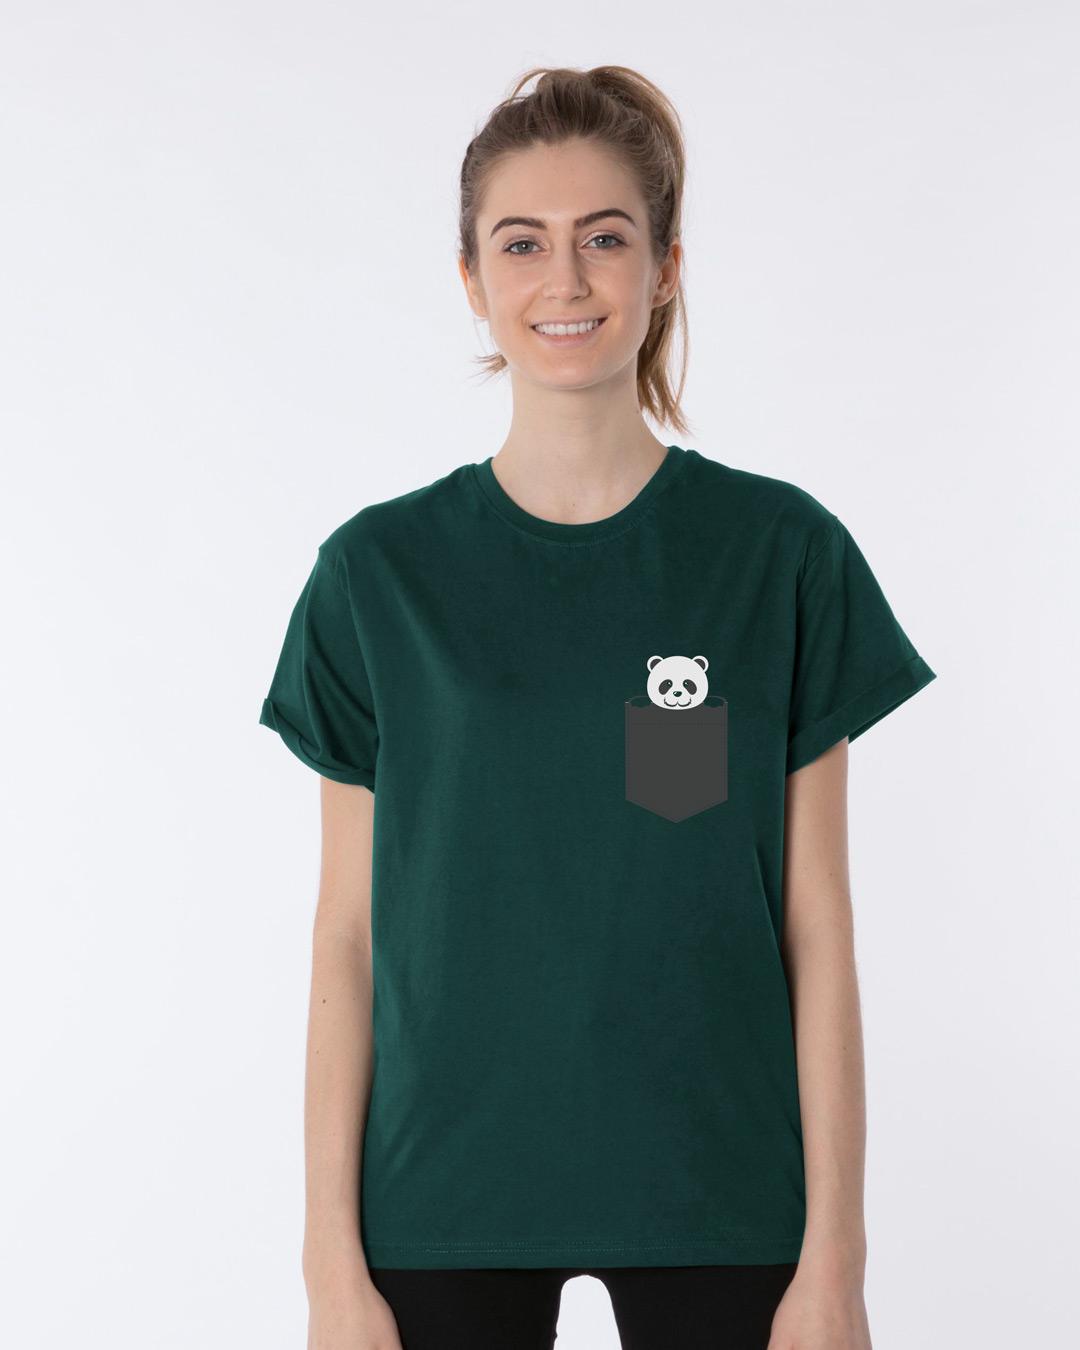 373b18647 Buy Pocket Panda Pine Green Printed Half Sleeve Boyfriend T-Shirt For Women  Online India   Bewakoof.com